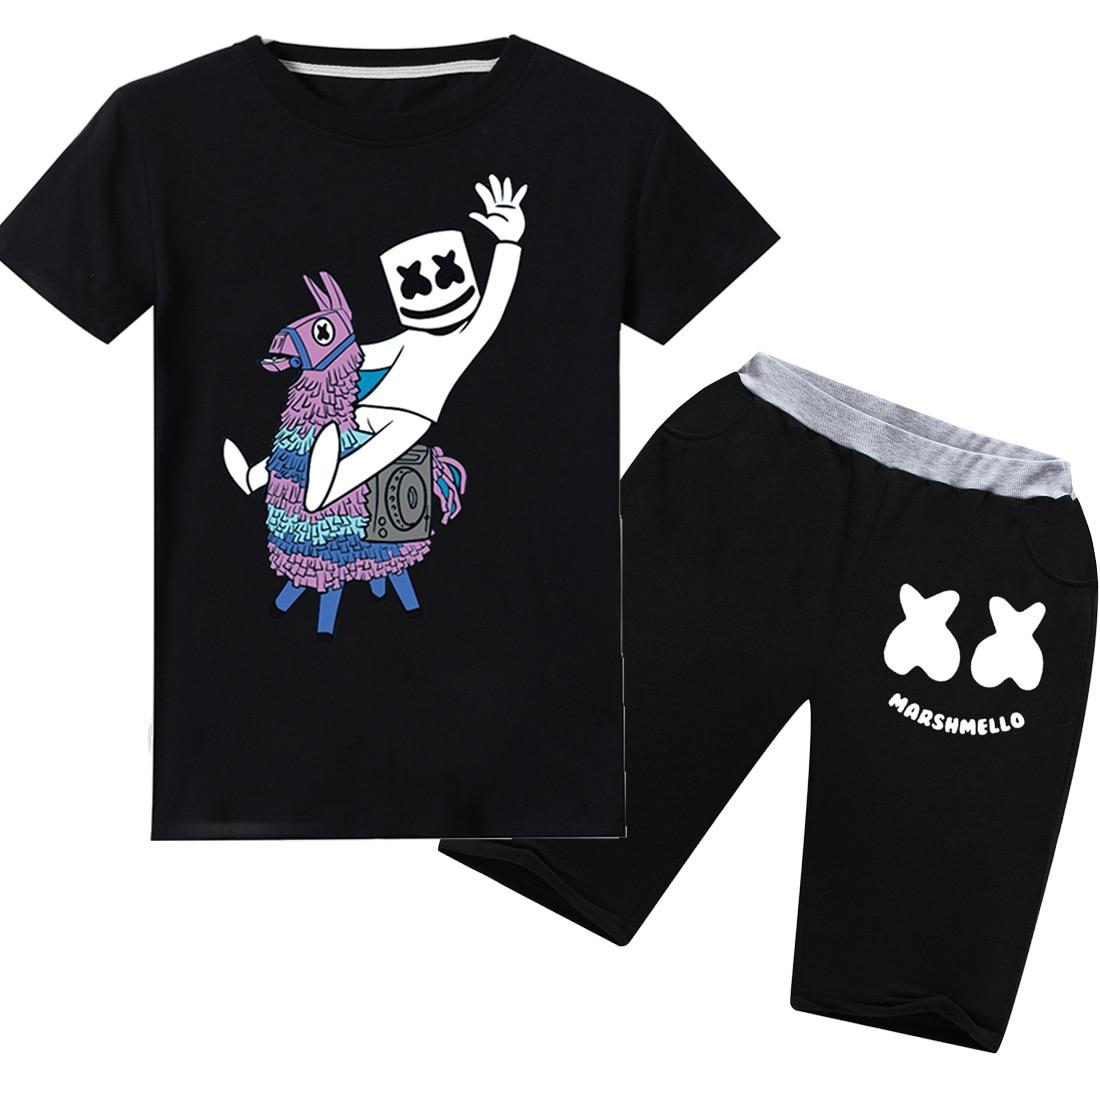 2PC DJ Marshmello Girls Boys Short Sleeve T-Shirt Kids Cotton Tops Clothes Pants